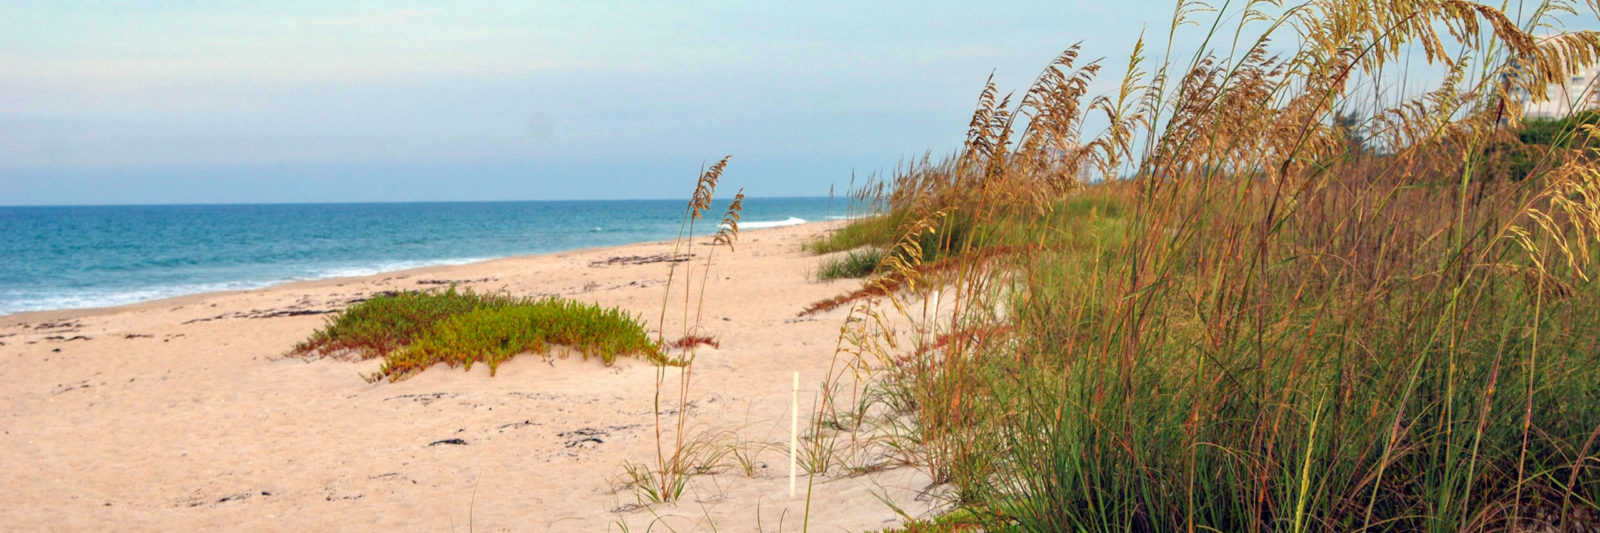 Avalon State Park Beach